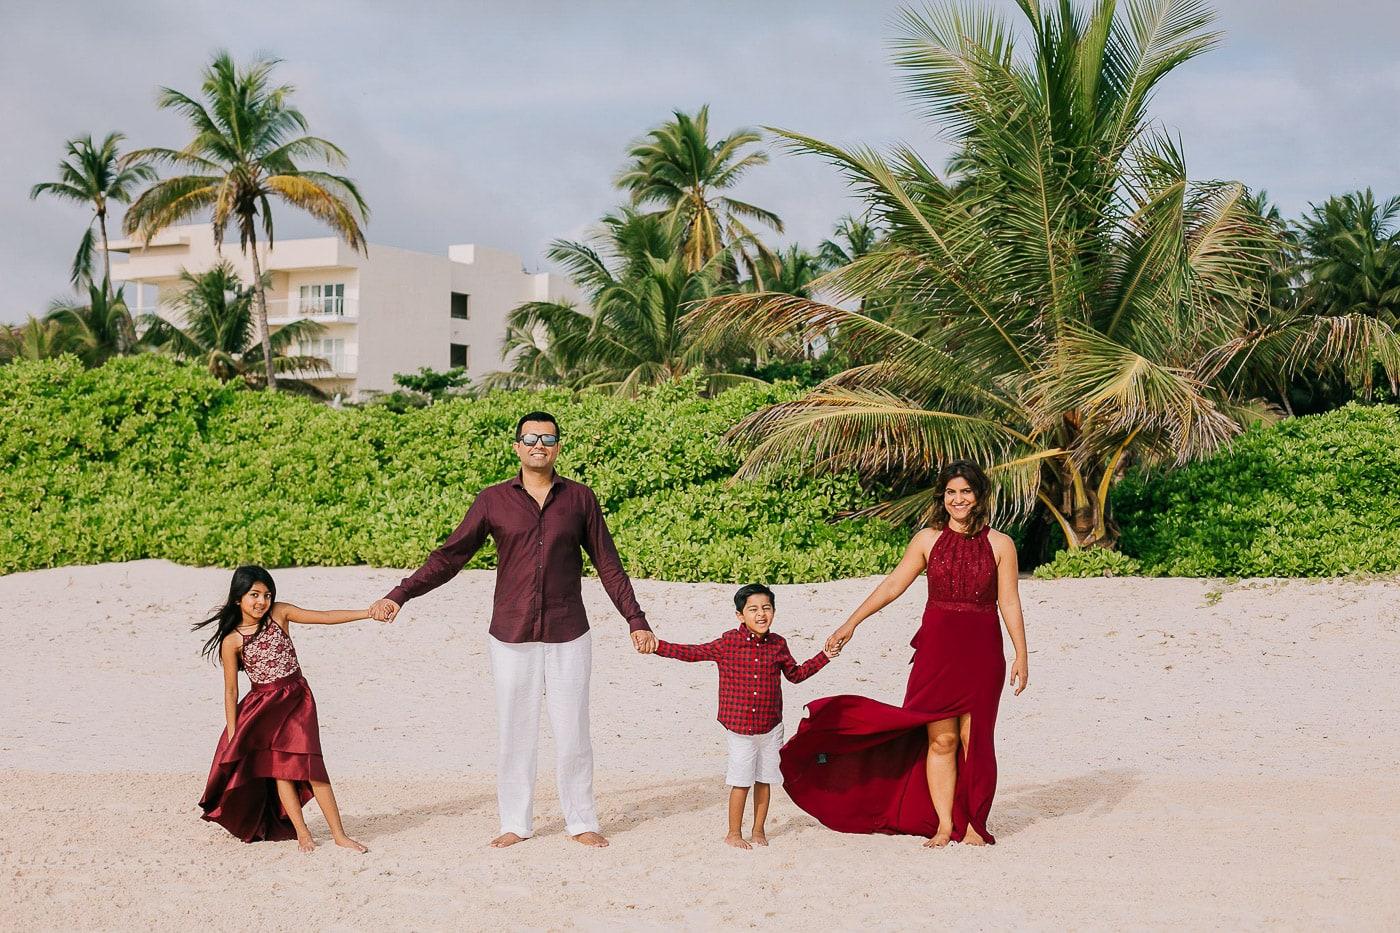 Family Photo Session in Punta Cana - The Pallavi Family